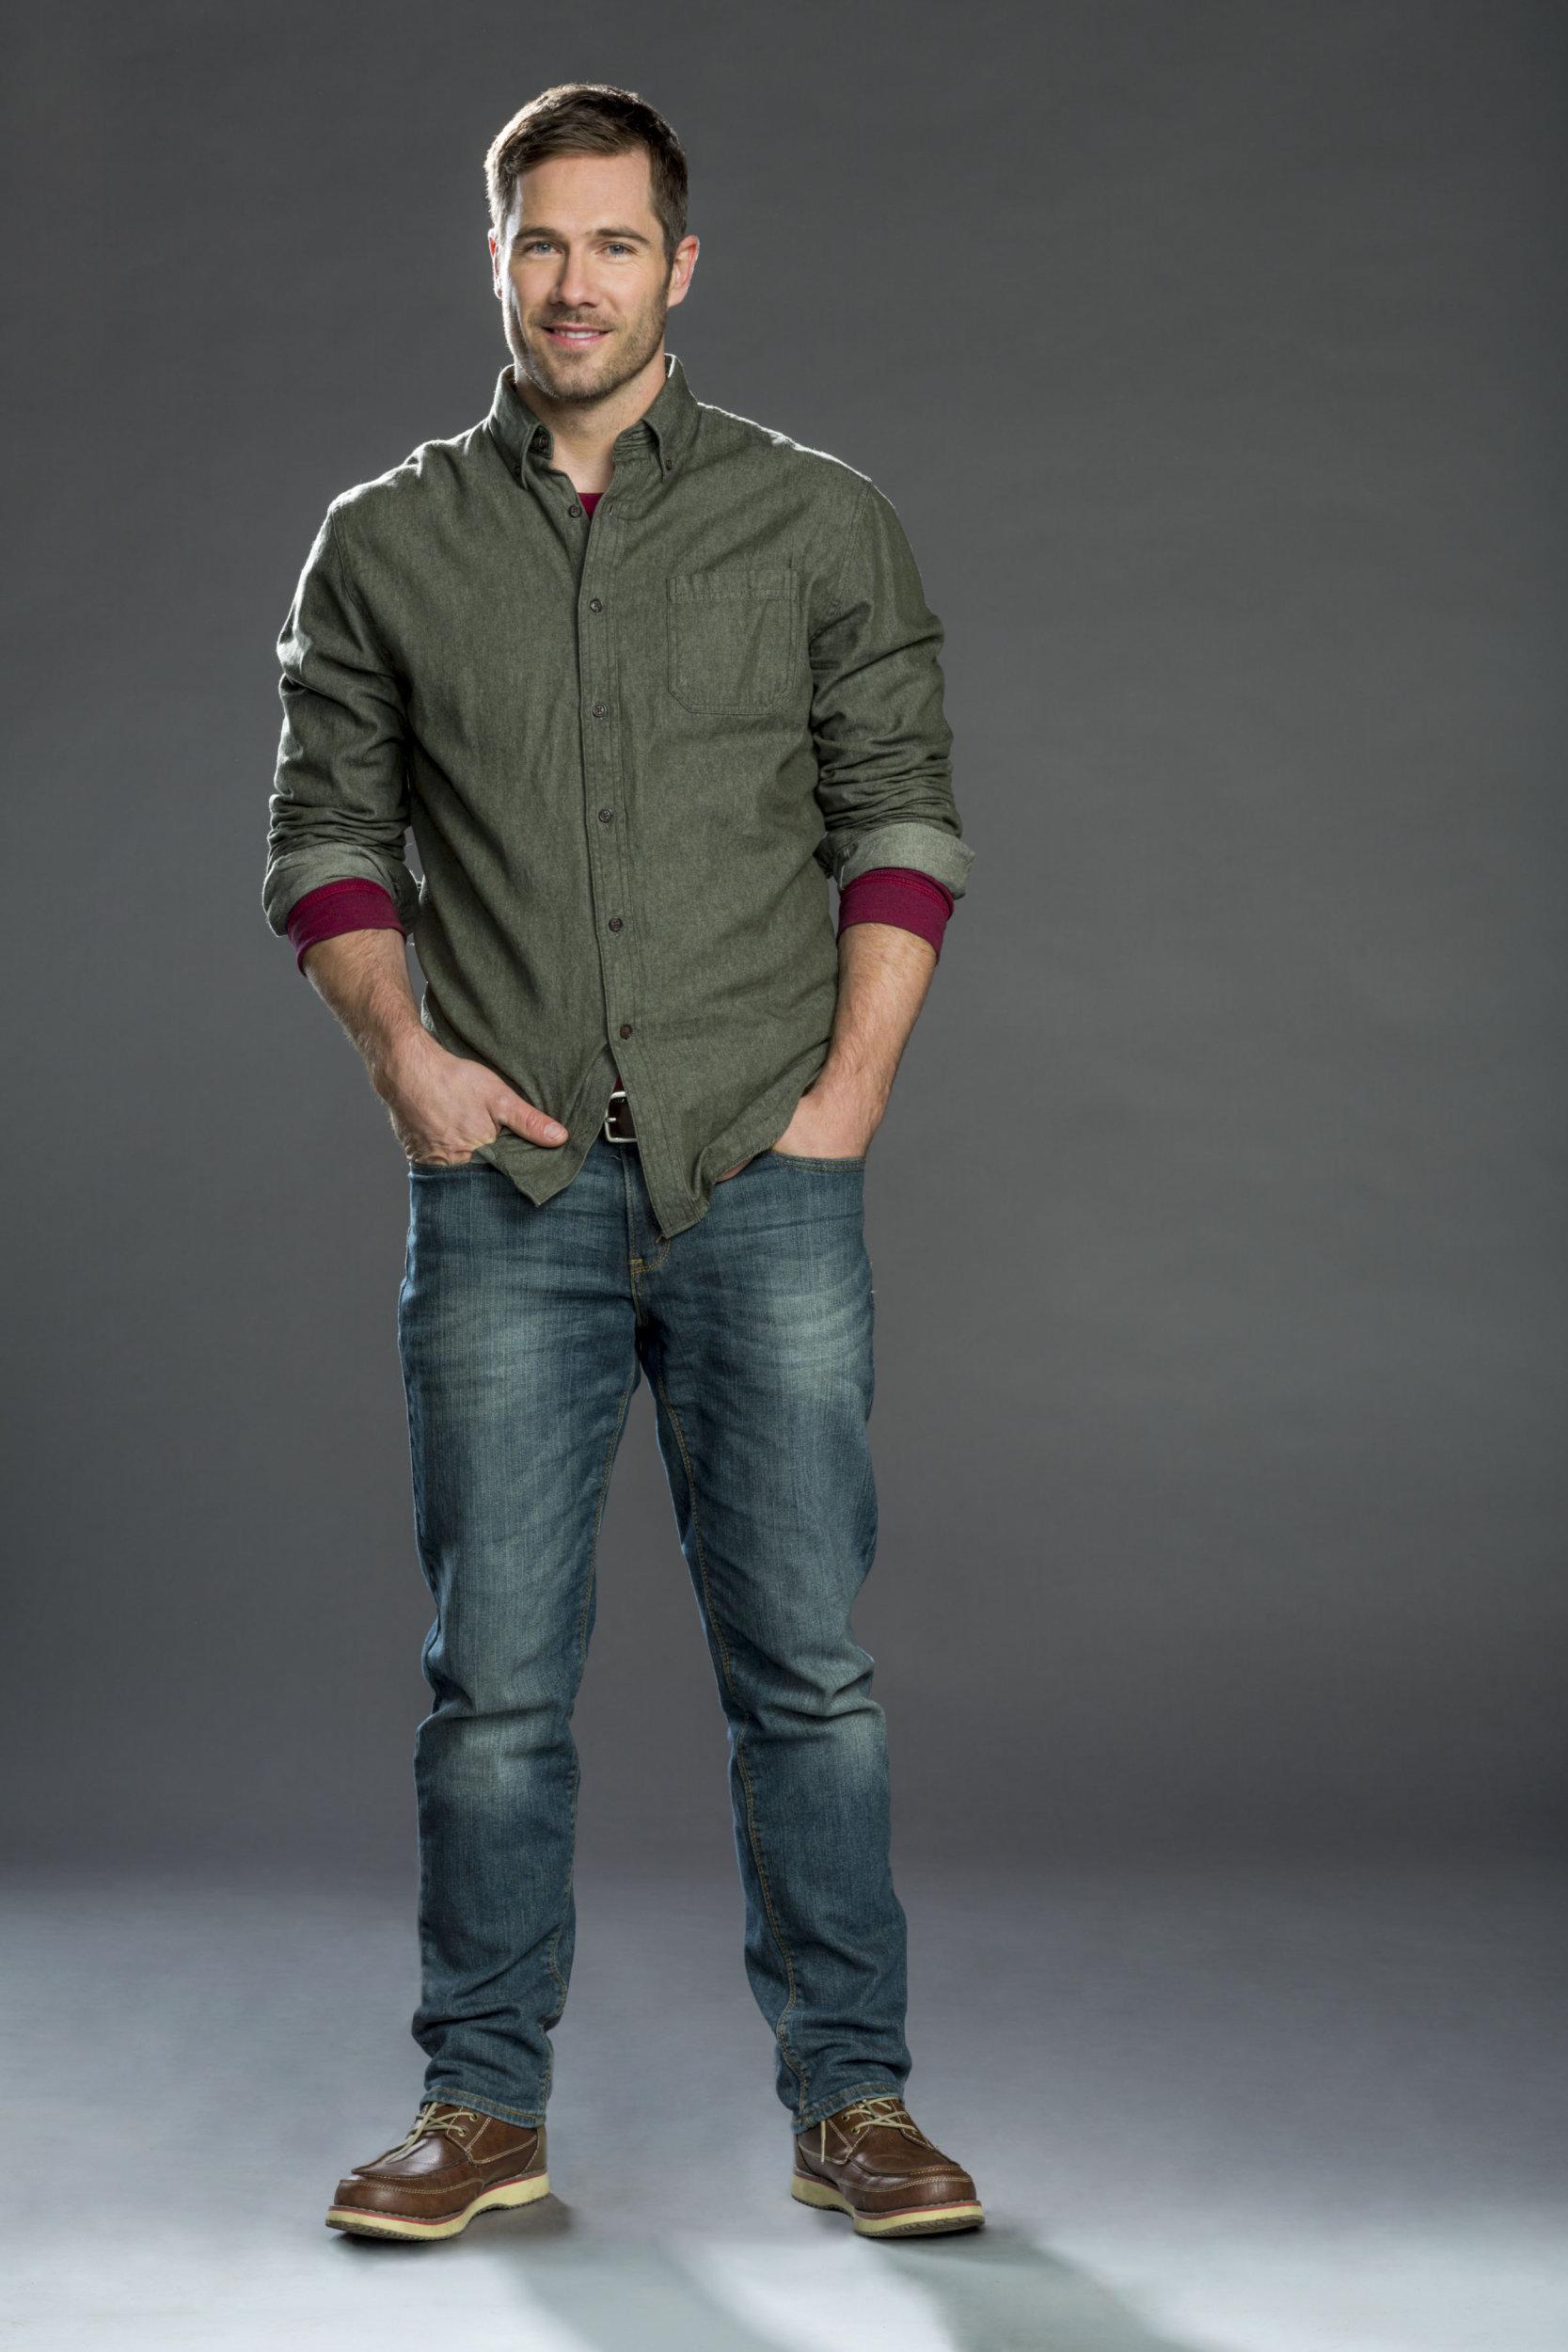 Luke Macfarlane as Tucker Martin on Christmas Land  Hallmark Channel